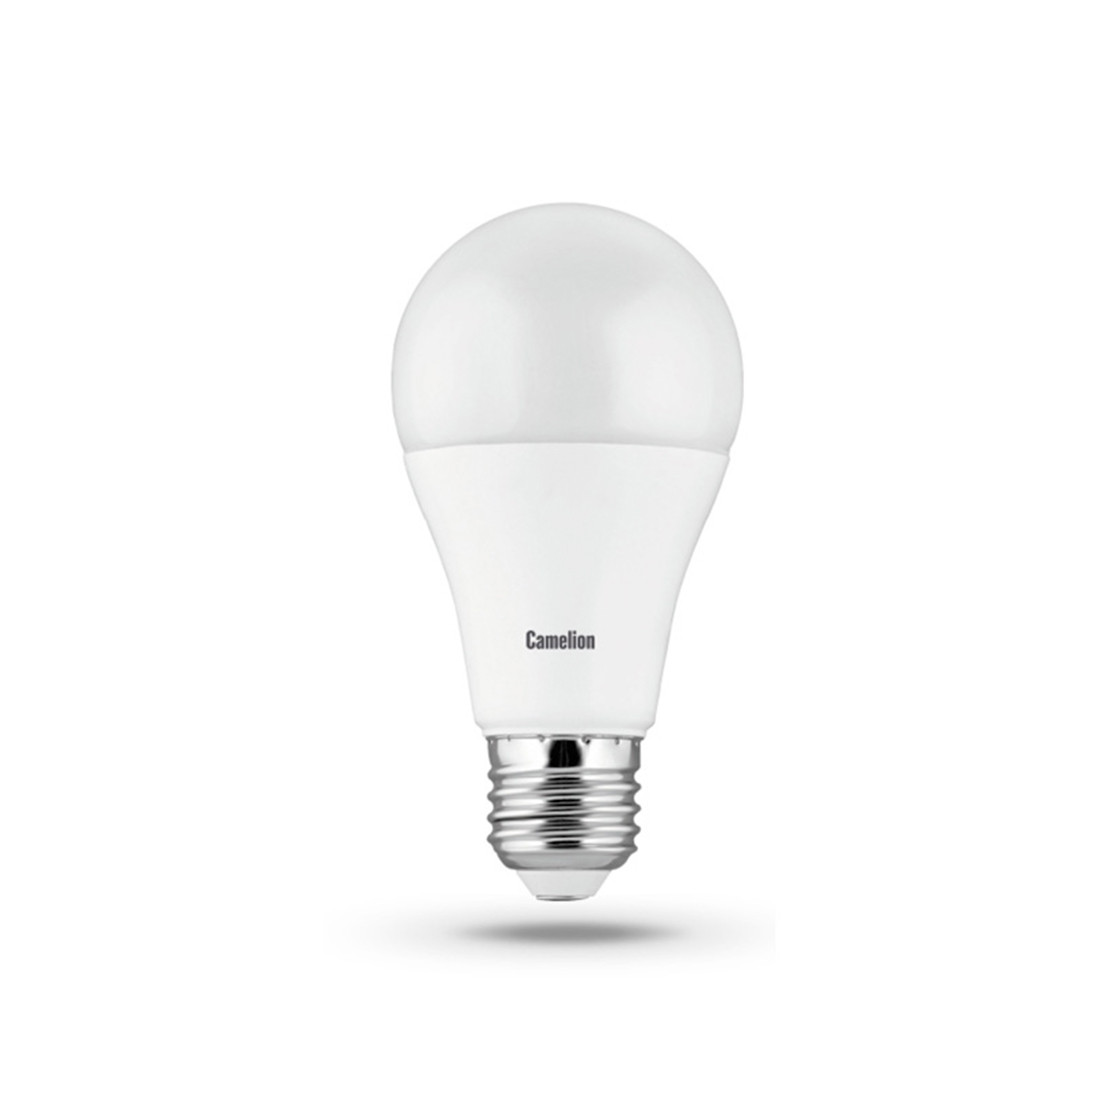 Эл. лампа светодиодная, Camelion, LED13-A60/845/E27